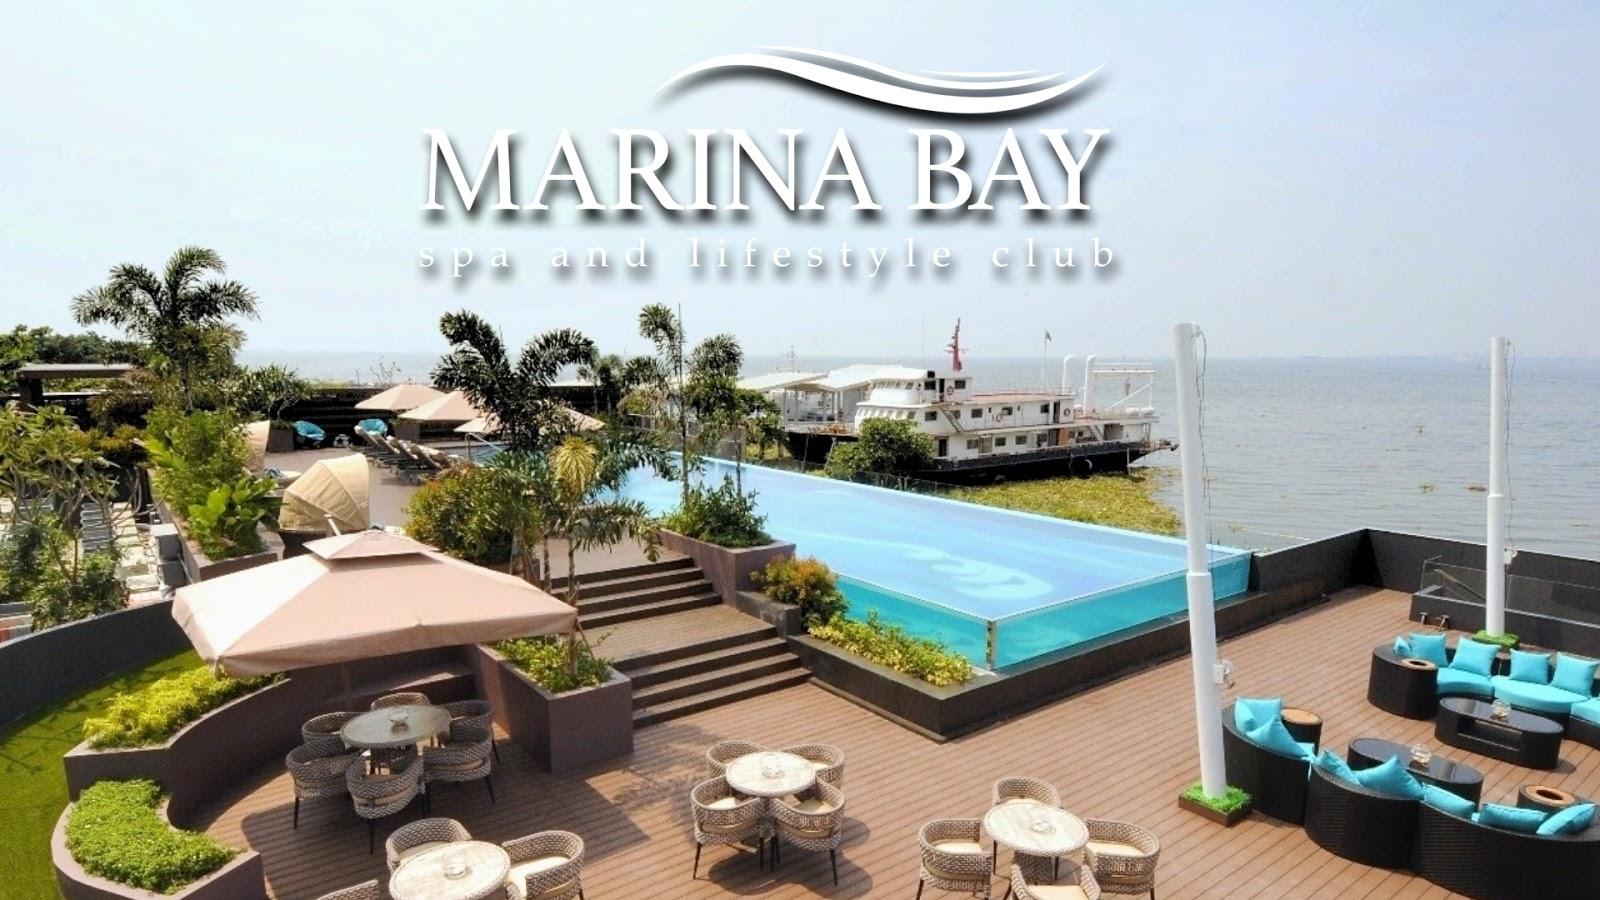 10 Reasons Why You Should Visit Marina Bay Spa and Lifestyle Club